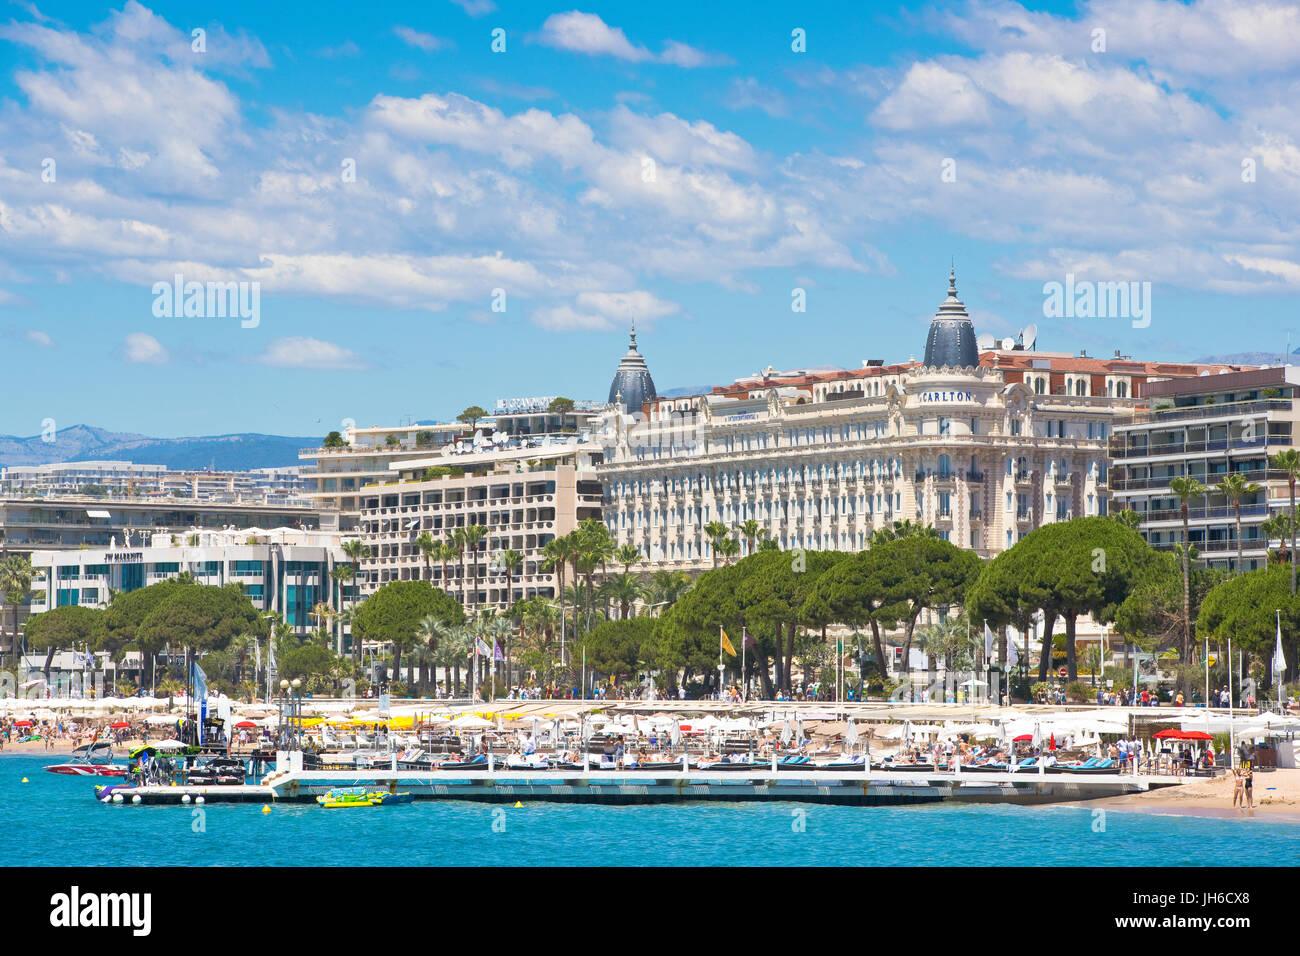 Promenade de la Croisette, Cannes, France with the famous hotel Carlton and Martinez - Stock Image